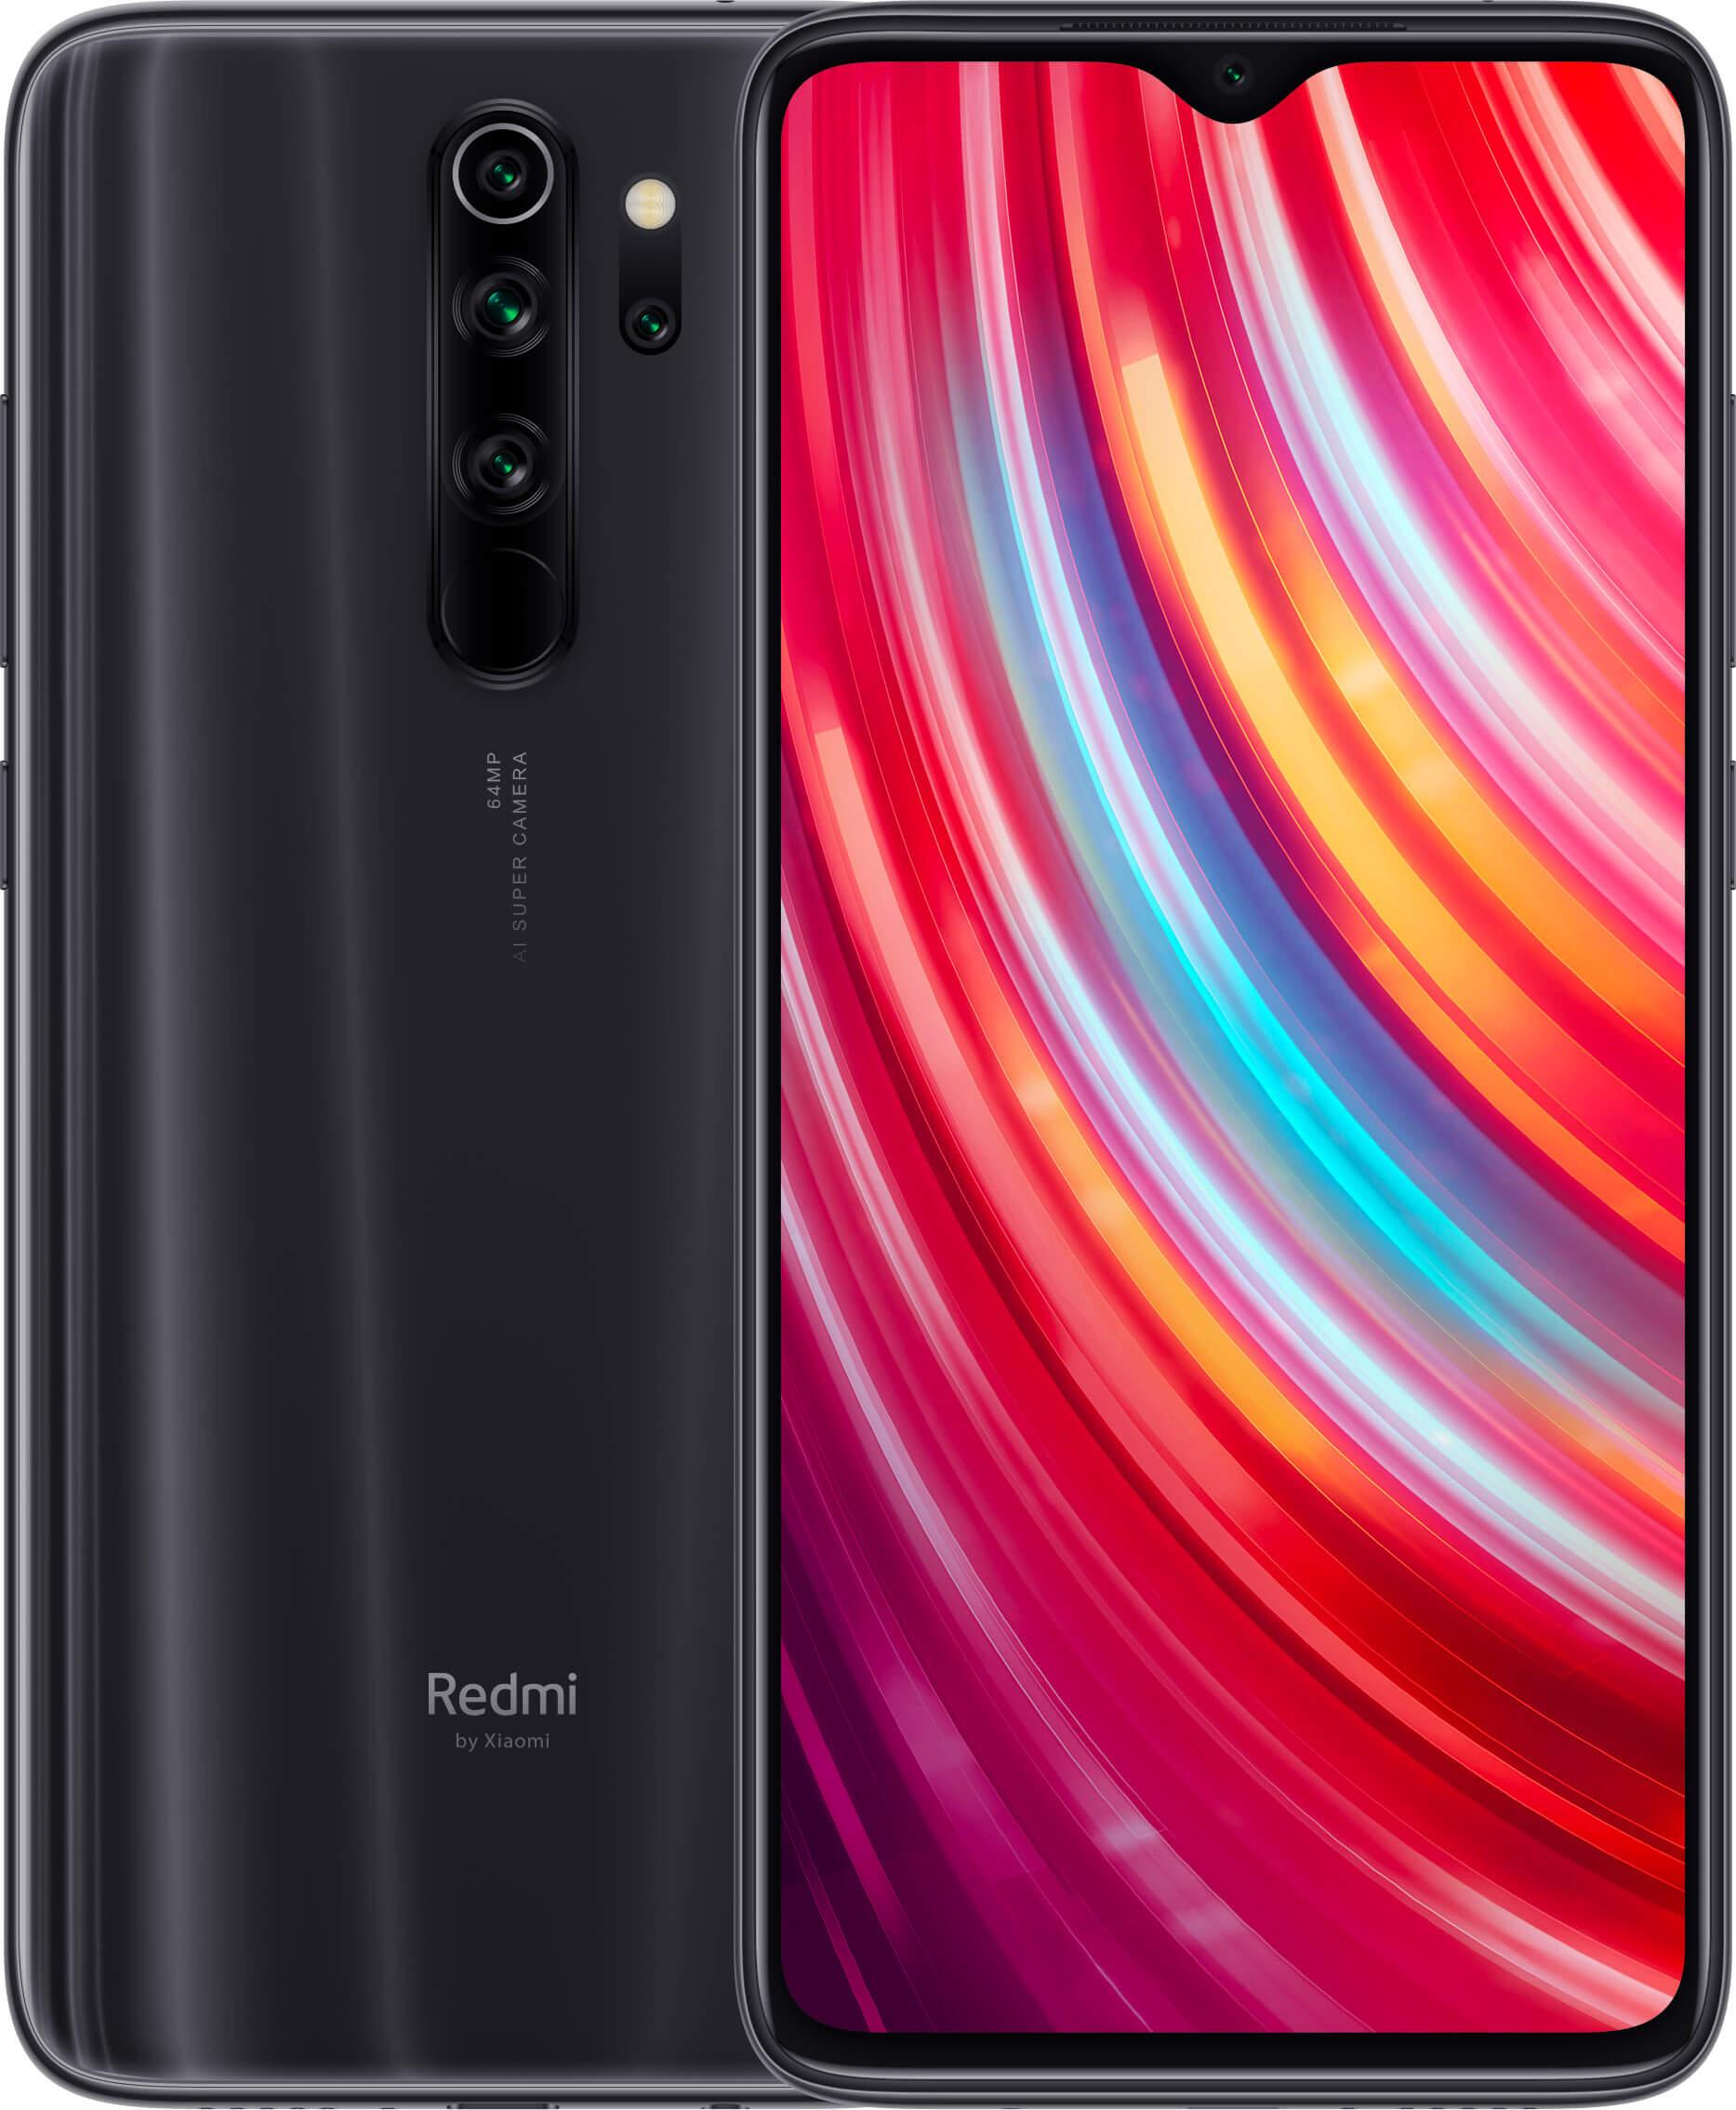 Xiaomi Redmi Note 8 PRO Dual SIM - 64GB, 6GB RAM, 4G LTE, Mineral Grey Global Versia